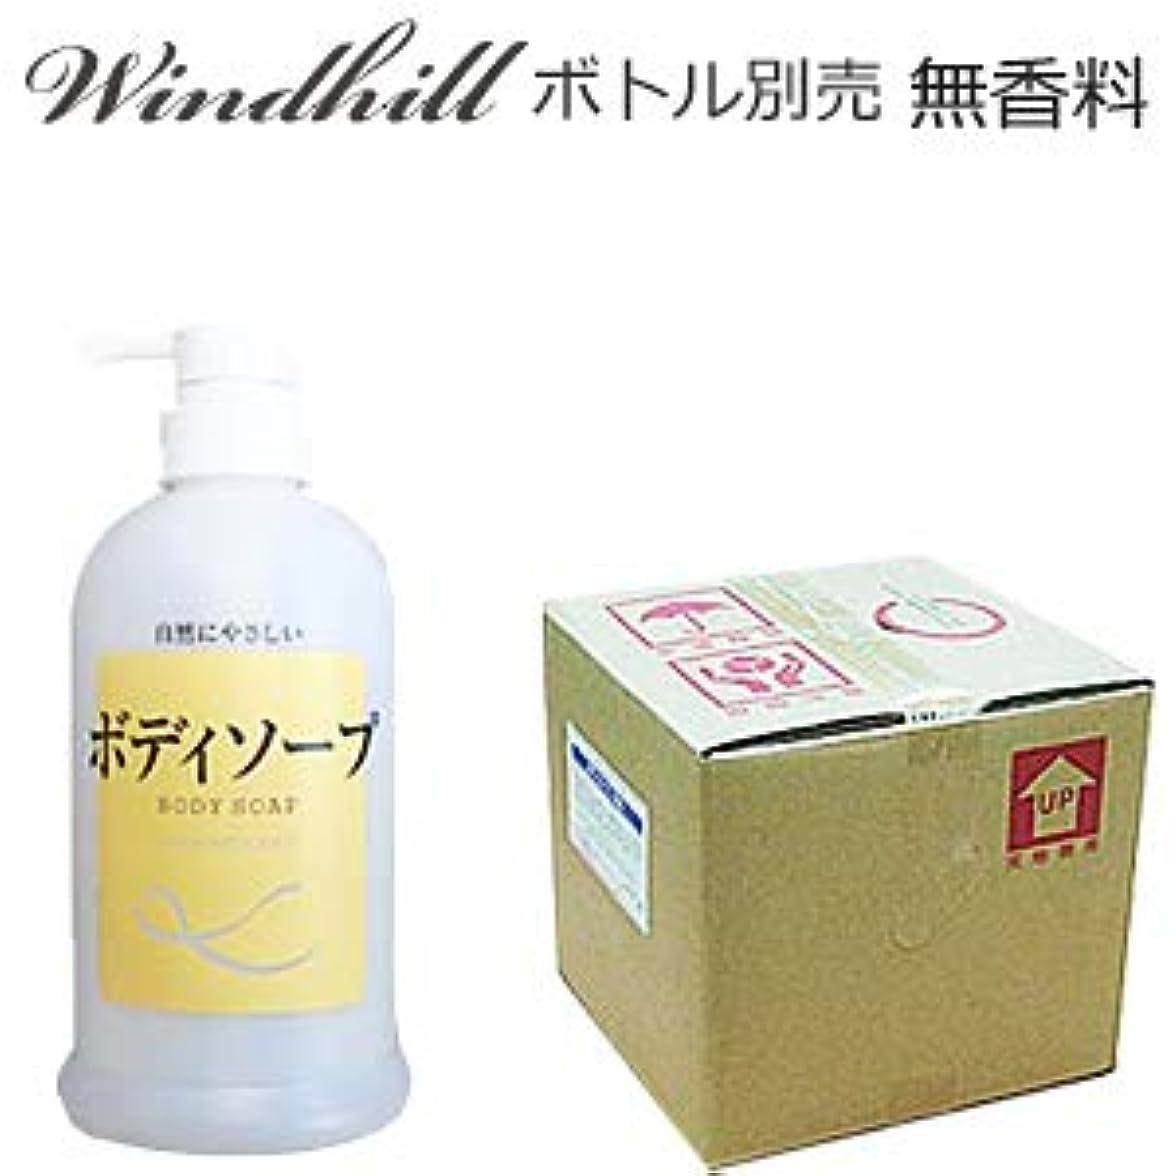 Windhill 植物性 業務用ボディソープ 無香料 20L(1セット20L入)